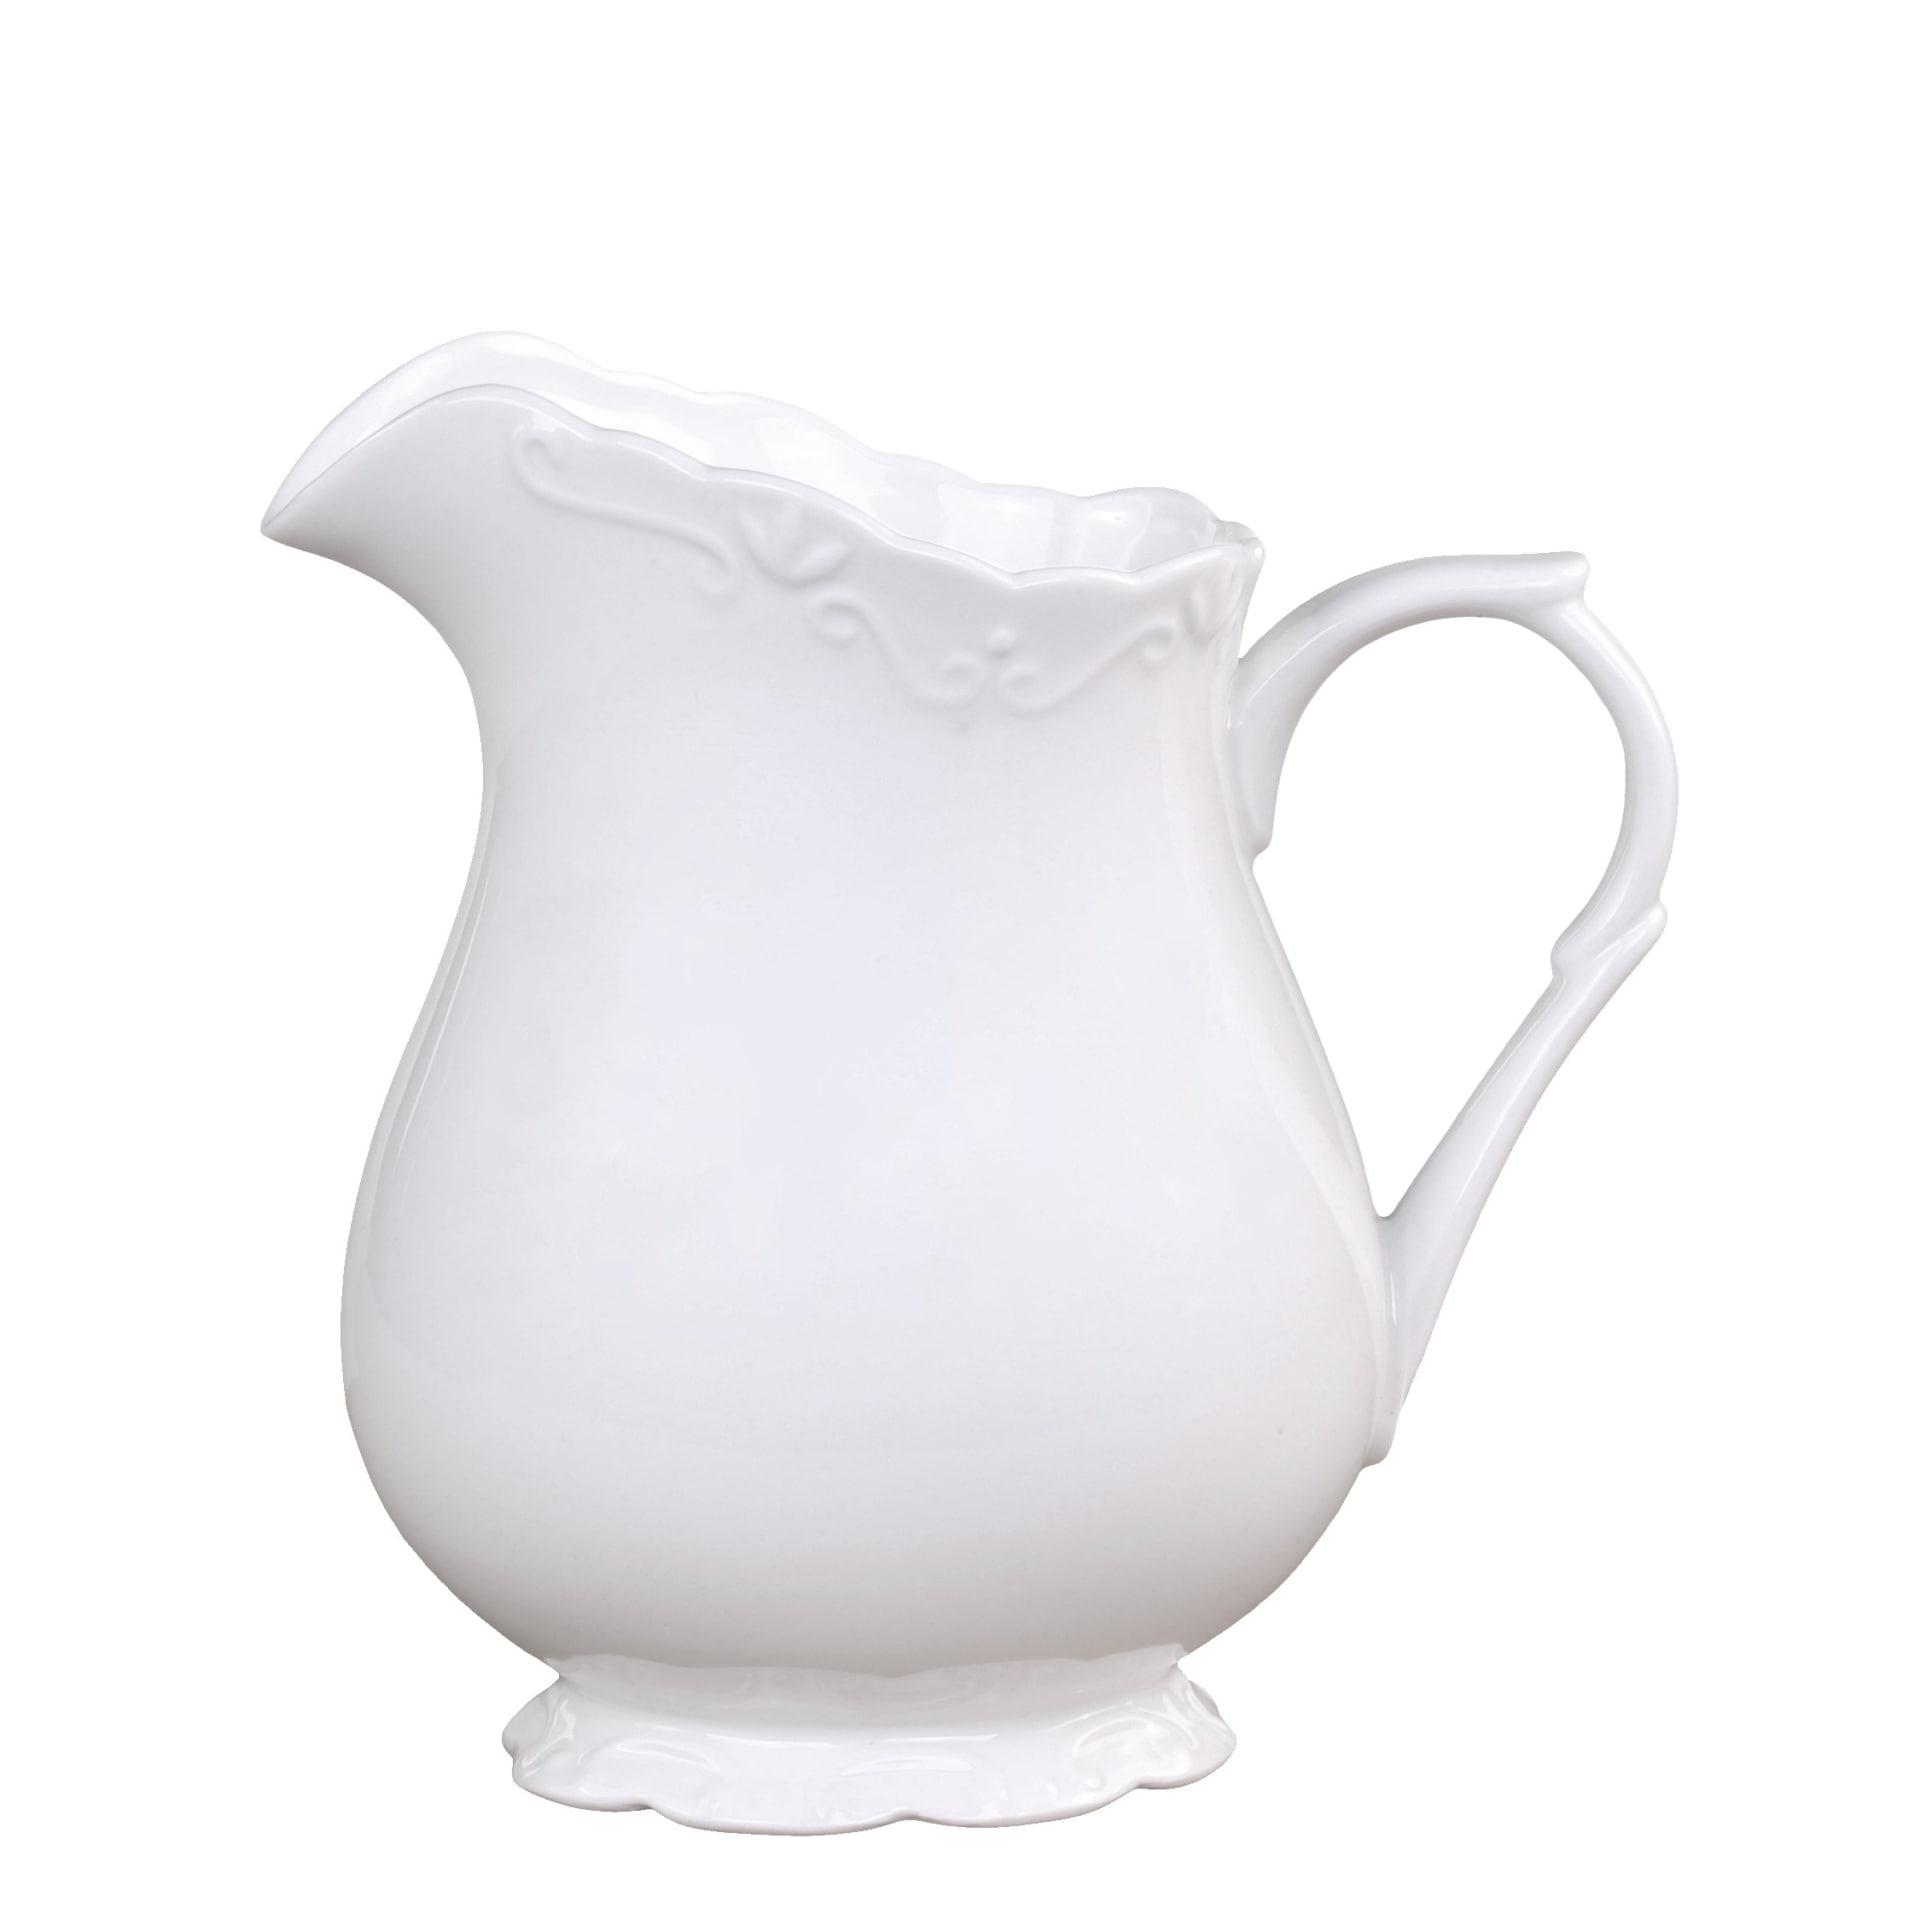 Chic Antique Džbán Provence, bílá barva, porcelán